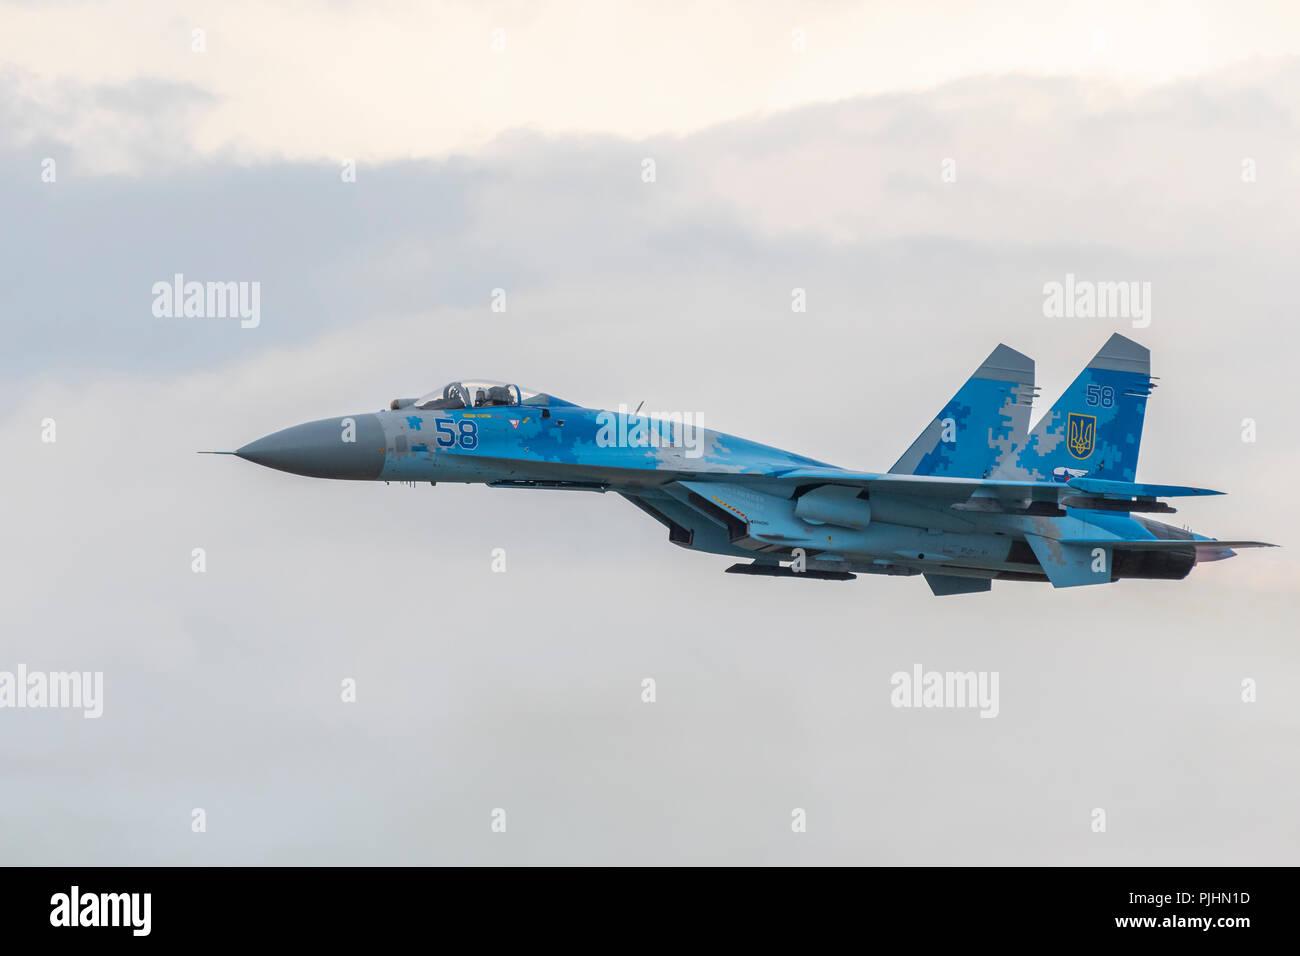 Ukrainian Su-27 Flanker, RIAT 2018, RAF Fairford, UK - Stock Image